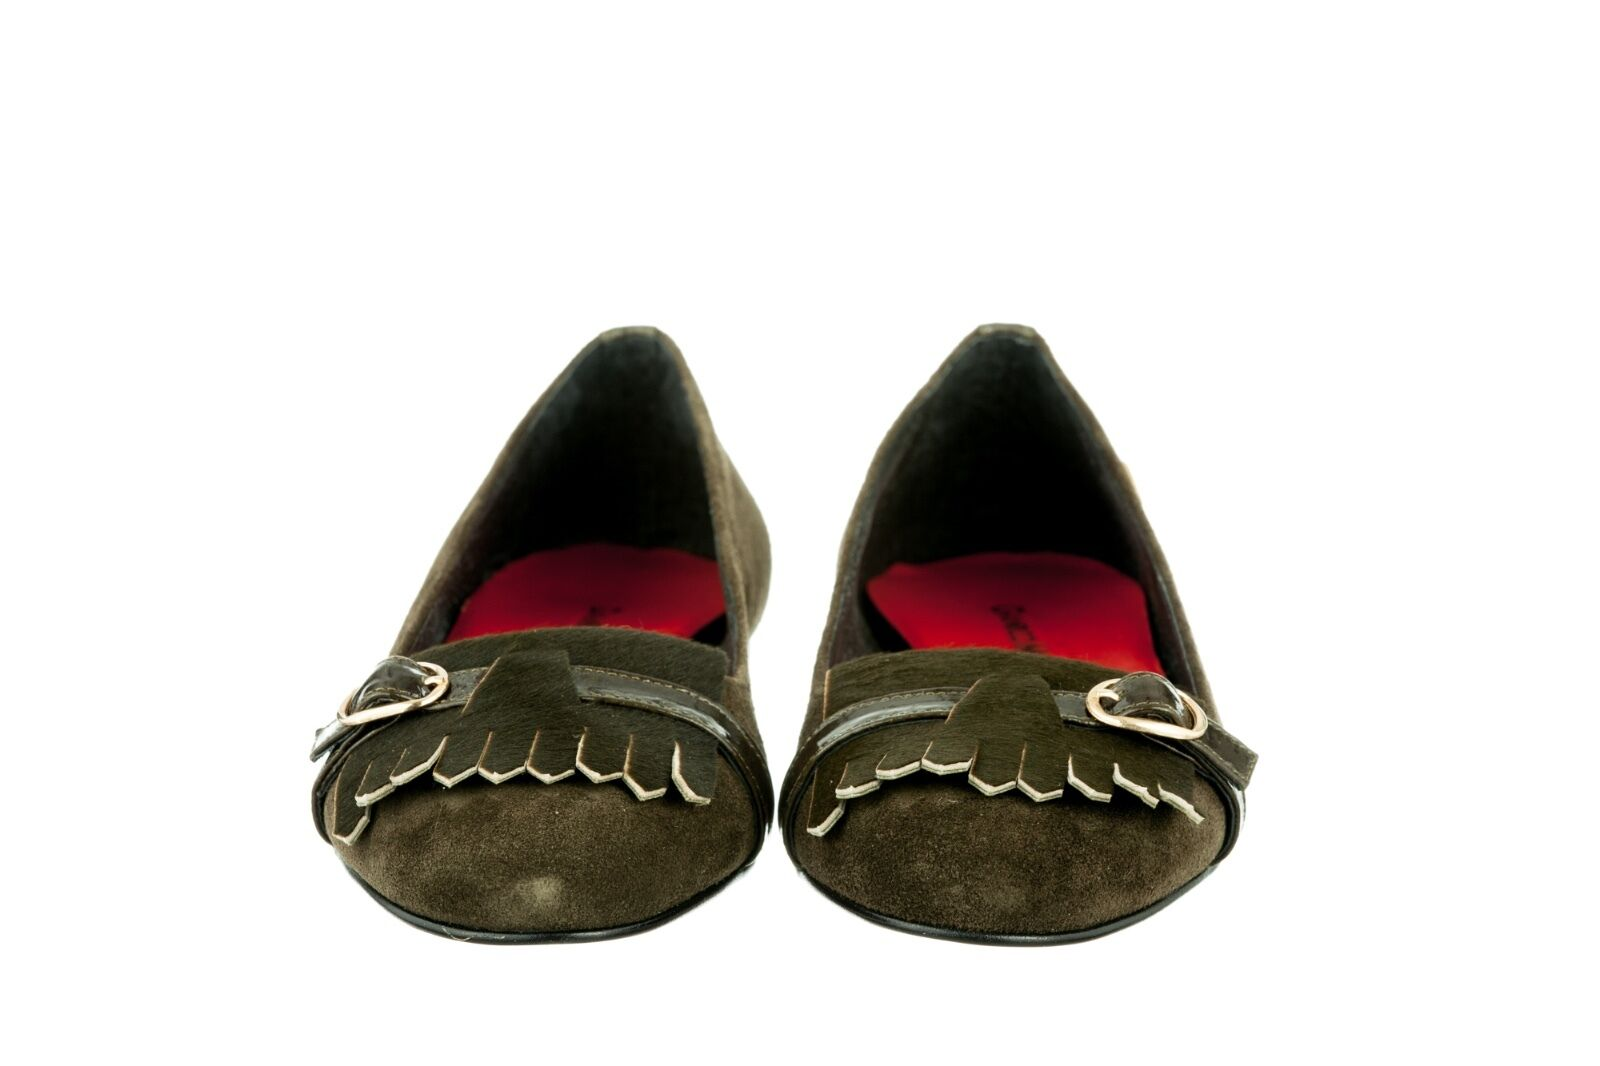 MORI MADE ITALY FLATS PONY SCHUHE Schuhe BALLERINA PONY FLATS SUEDE LEATHER GREEN VERDE 39 c48f70